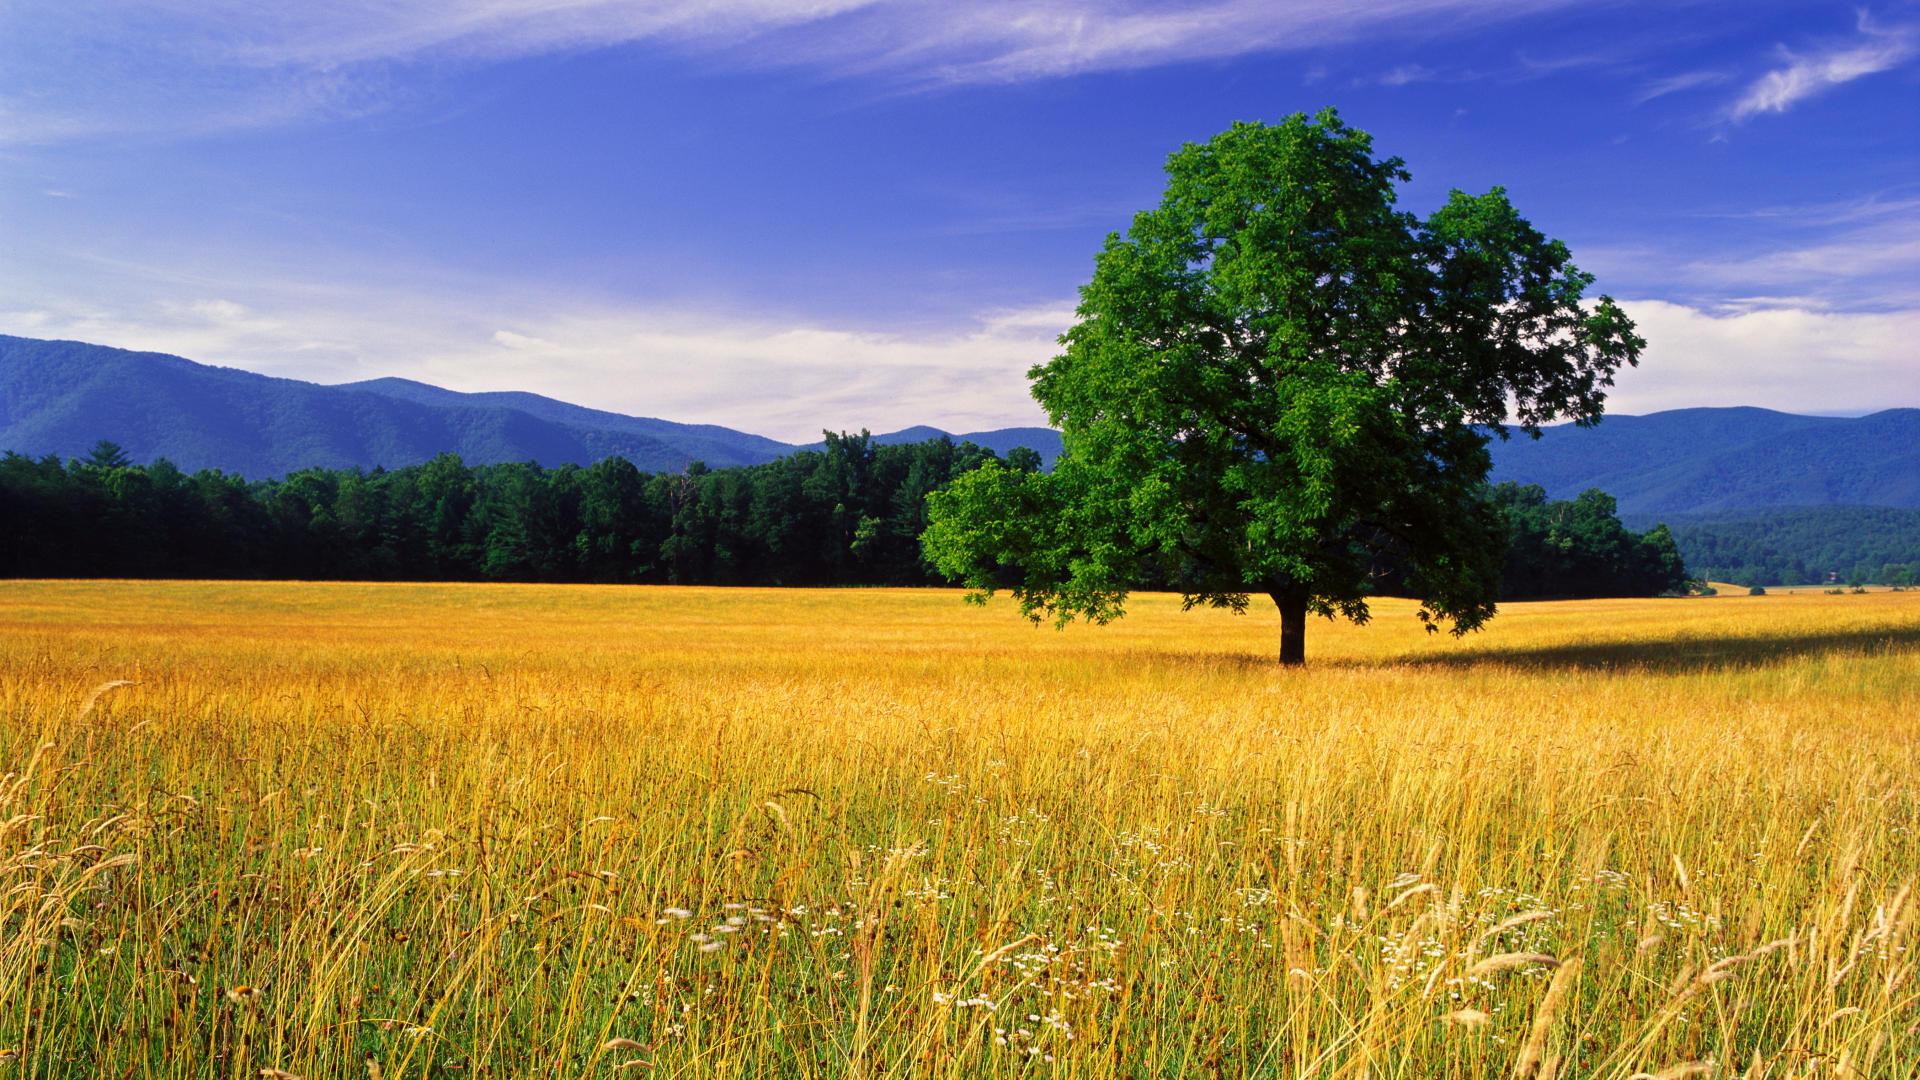 Great landscape s wallpaper 1920x1080 27185 for Good landscape